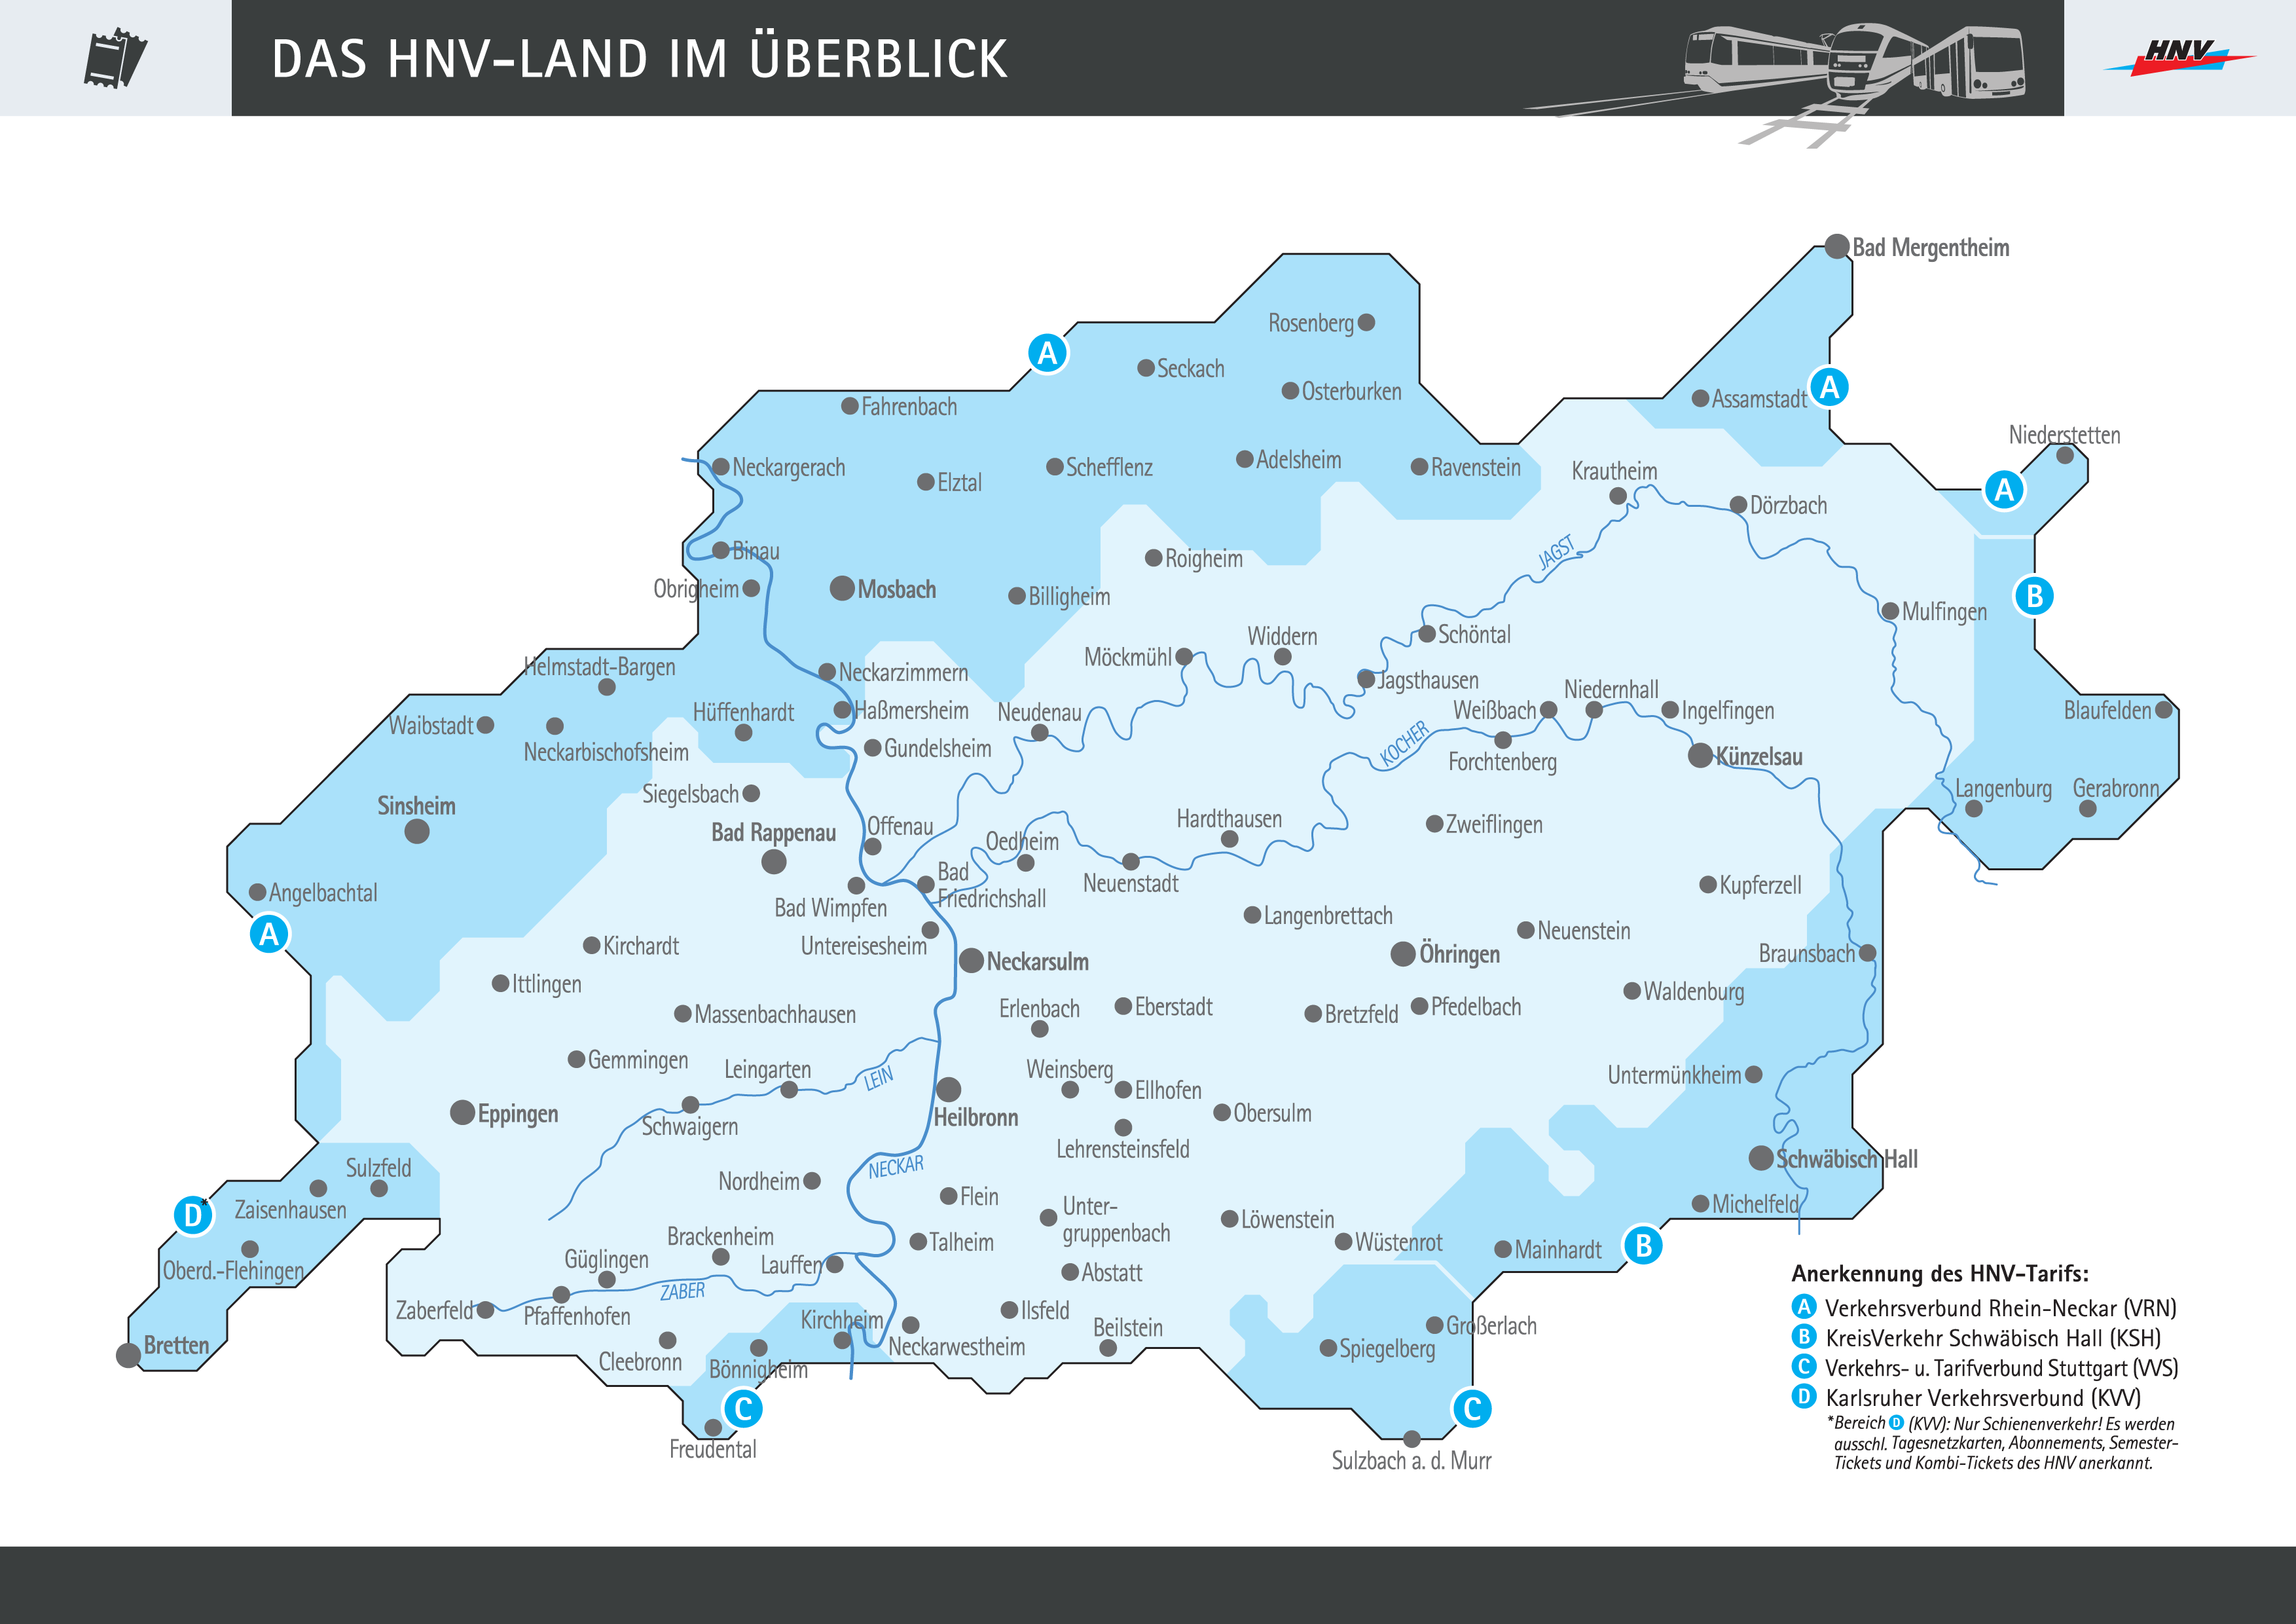 vrn karte VRN | Übergang zum Heilbronner Hohenloher Haller Nahverkehr GmbH (HNV)